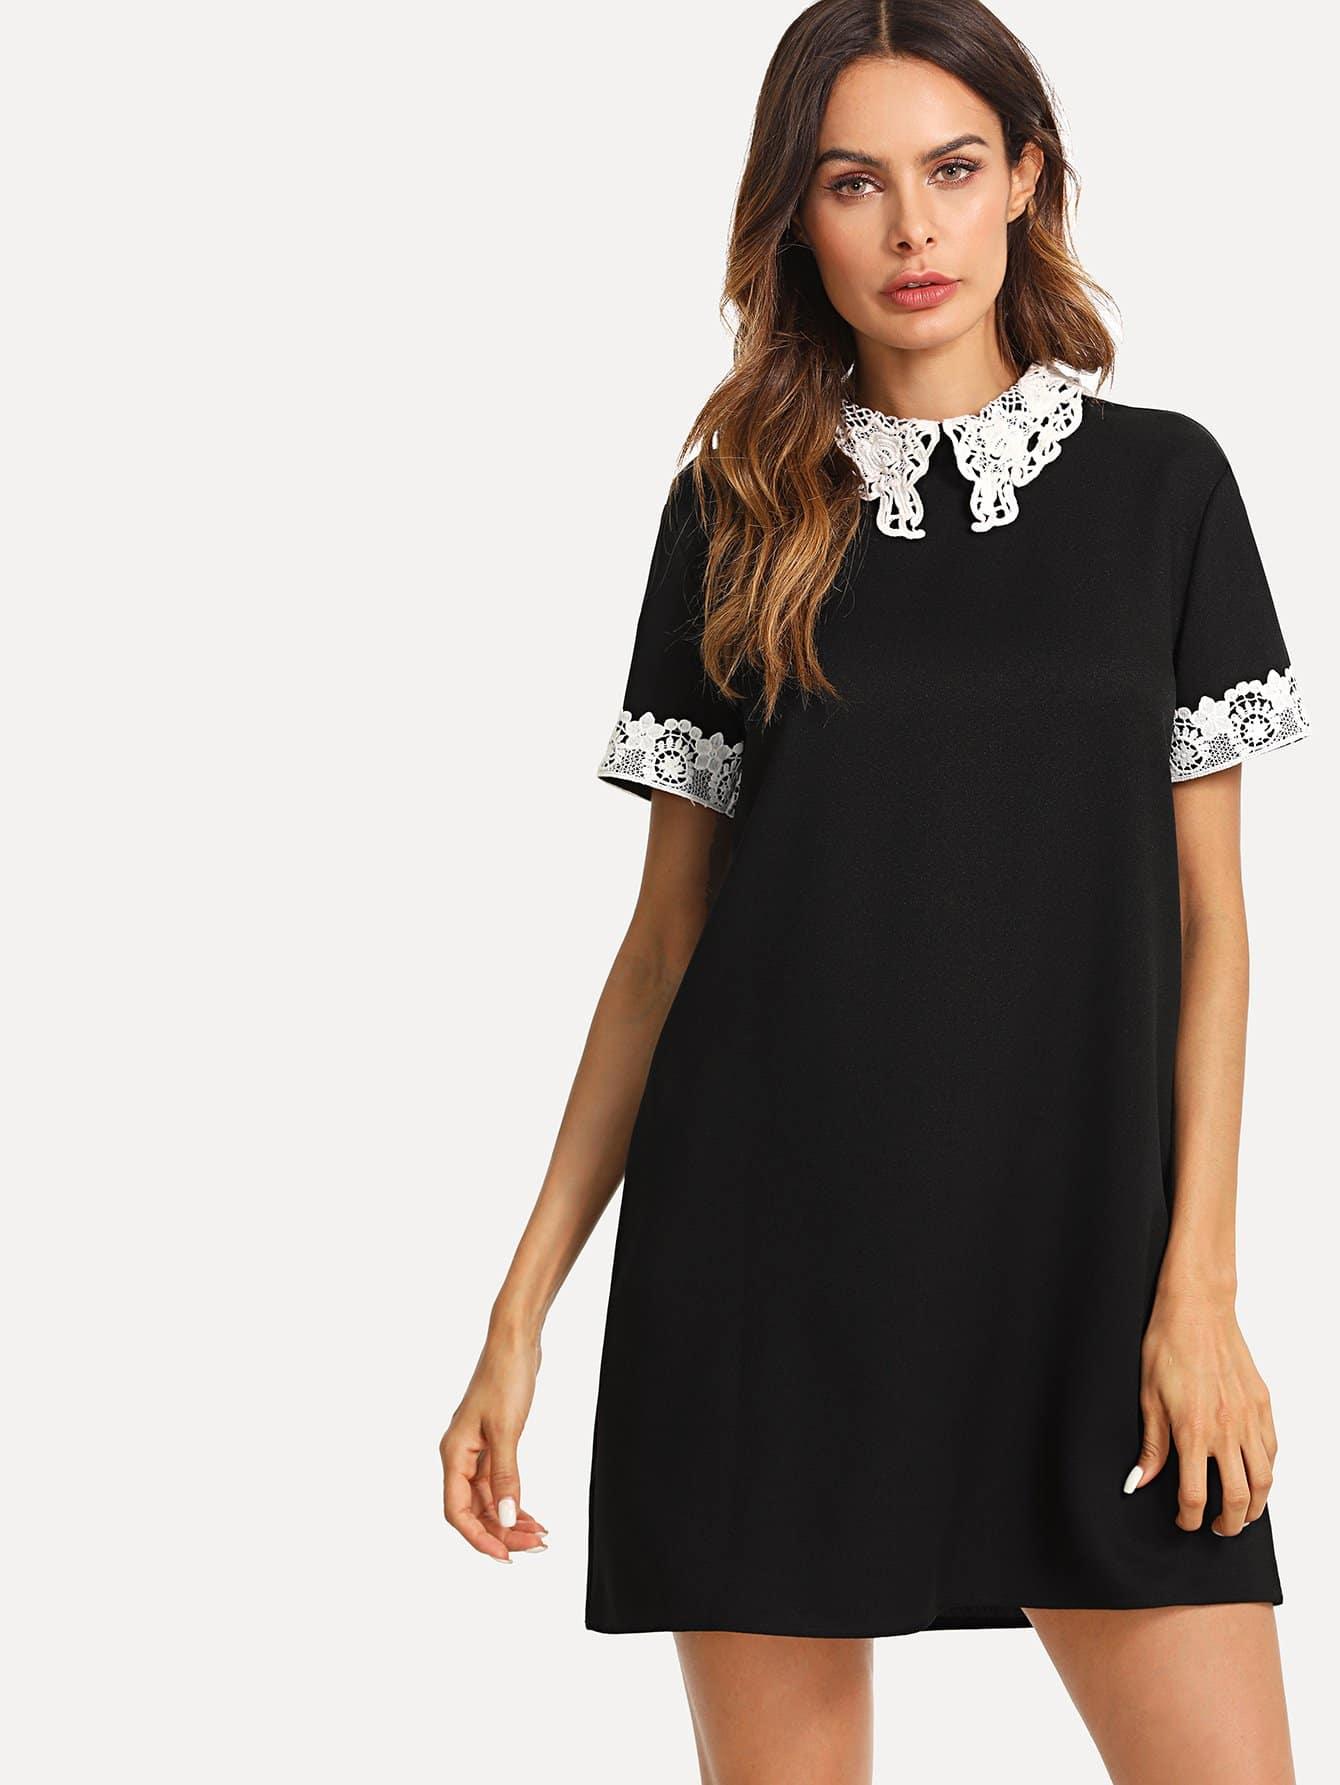 Lace Collar and Cuff Tunic Dress lace collar and cuff tunic dress